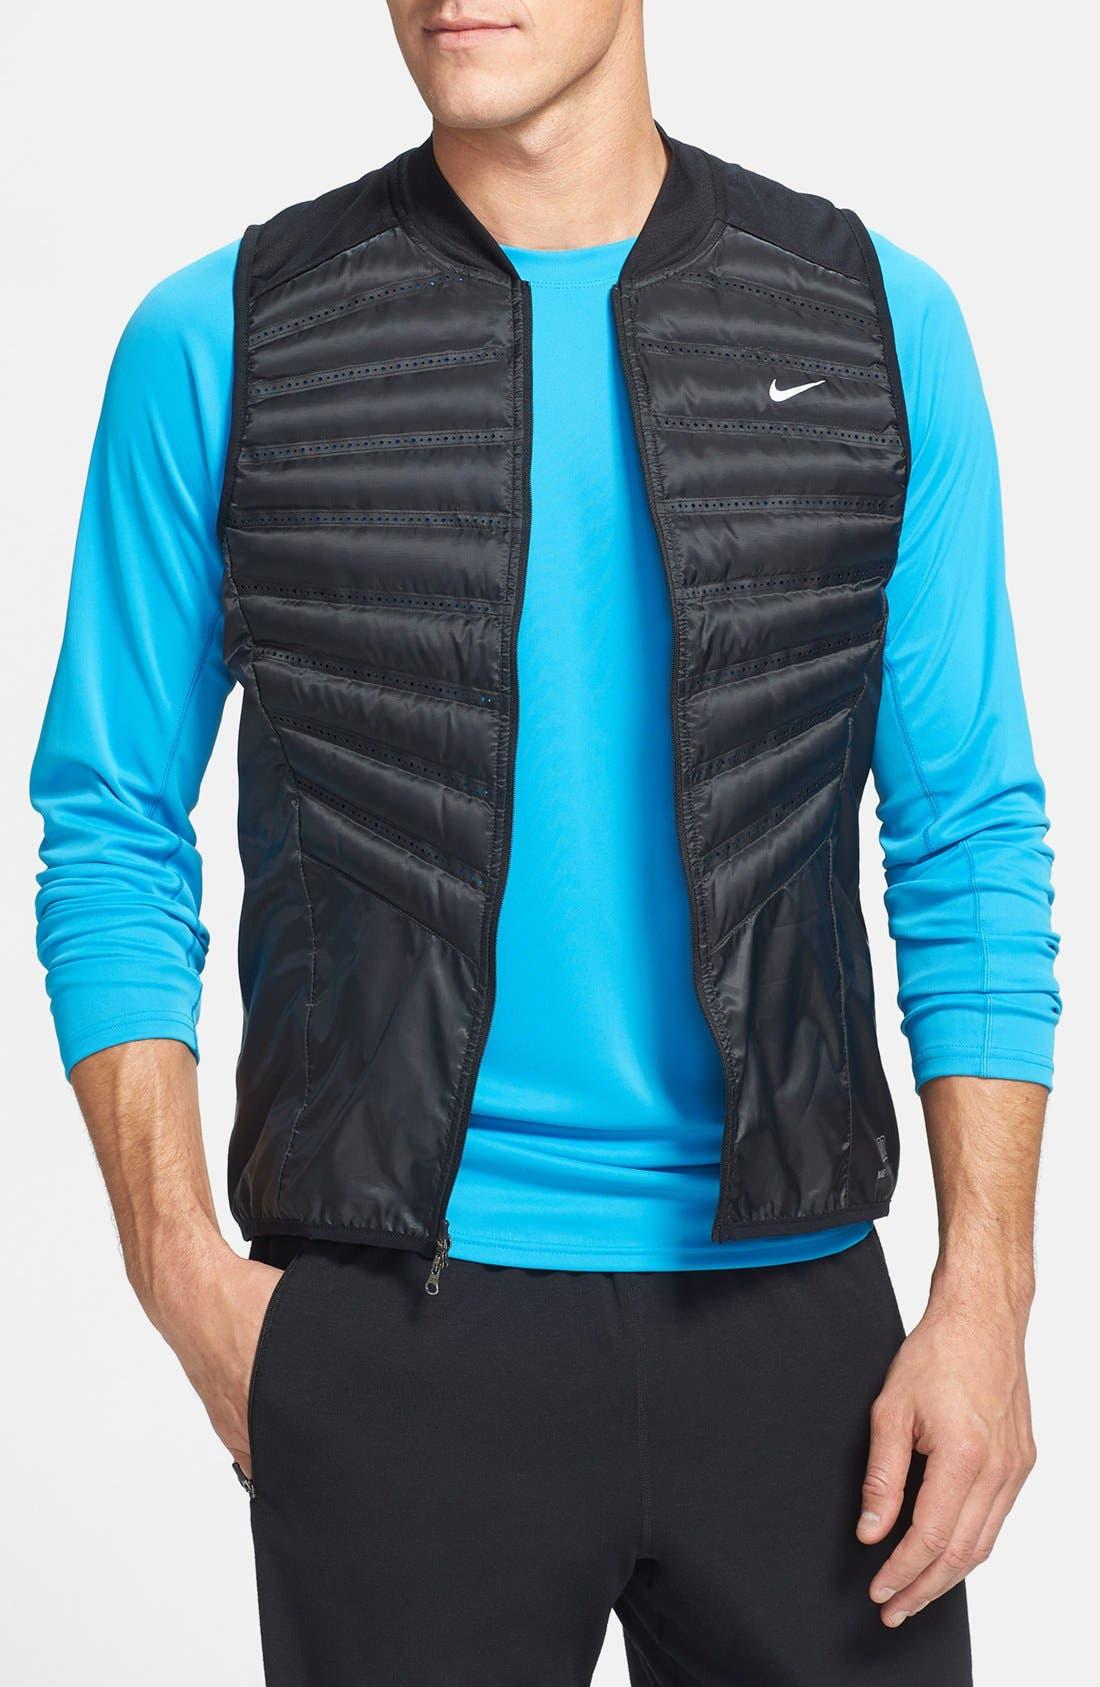 Alternate Image 1 Selected - Nike 'Aeroloft' Insulated Running Vest